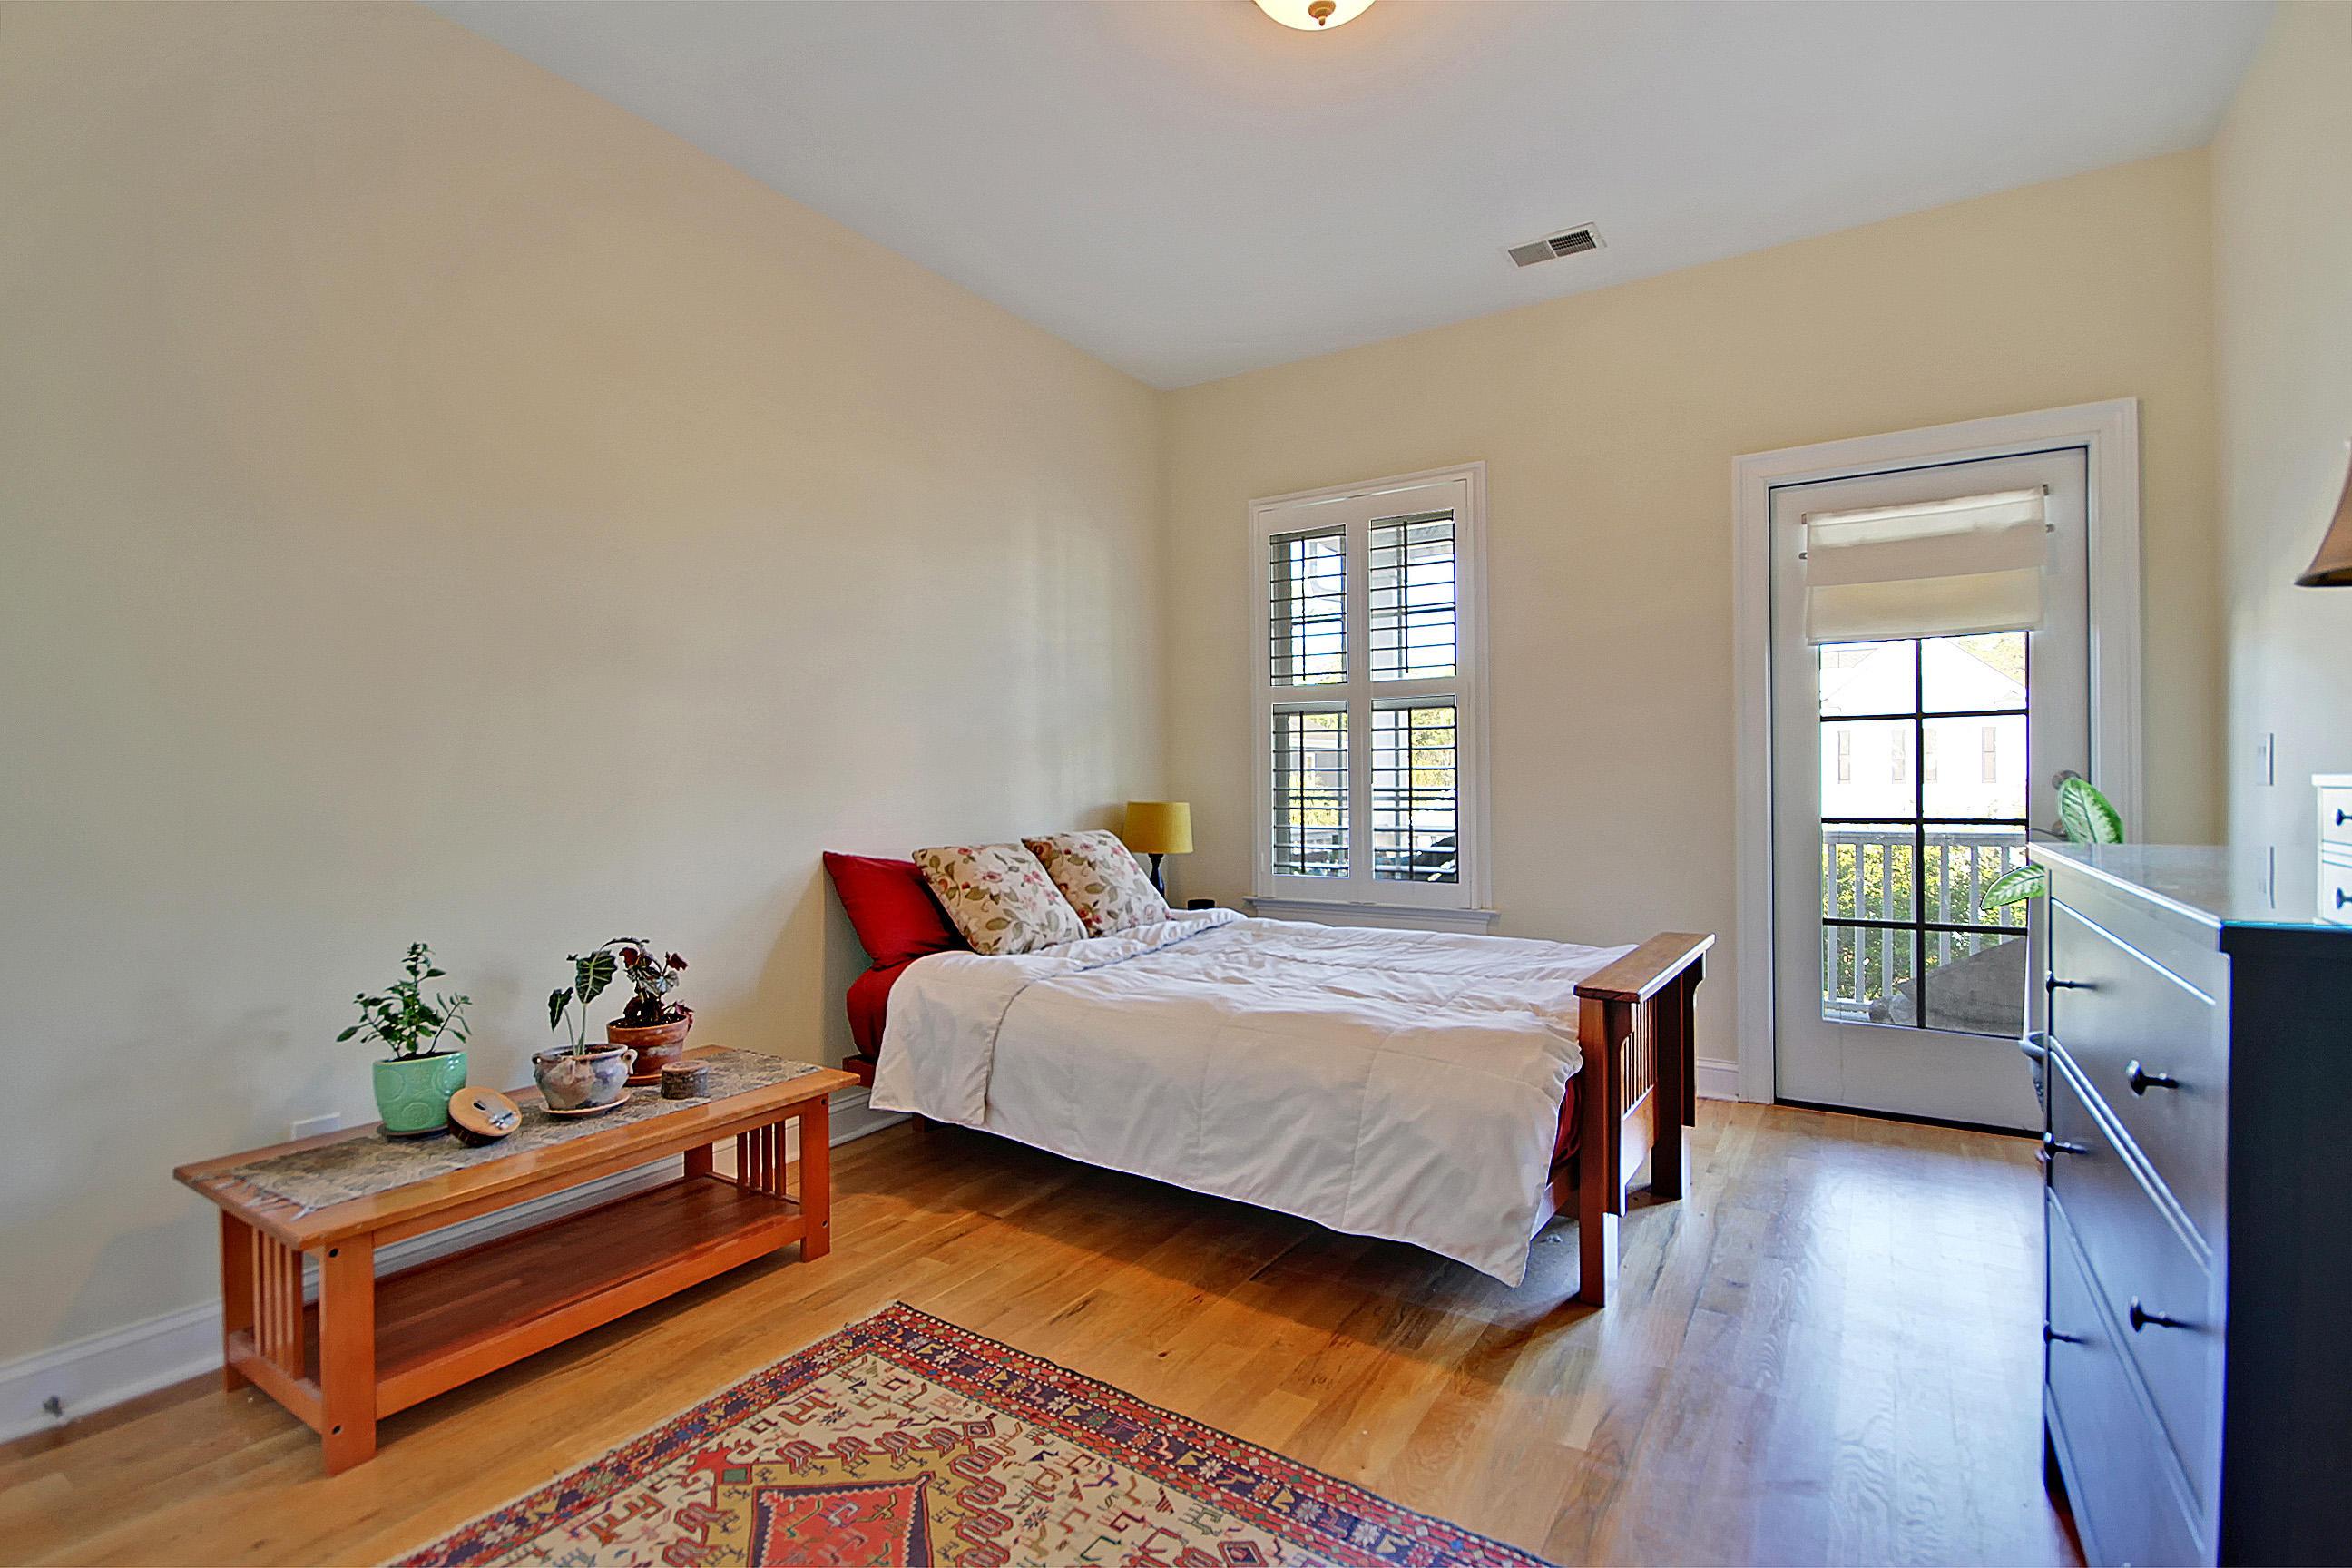 Cloudbreak Court Homes For Sale - 638 Cloudbreak, Charleston, SC - 2